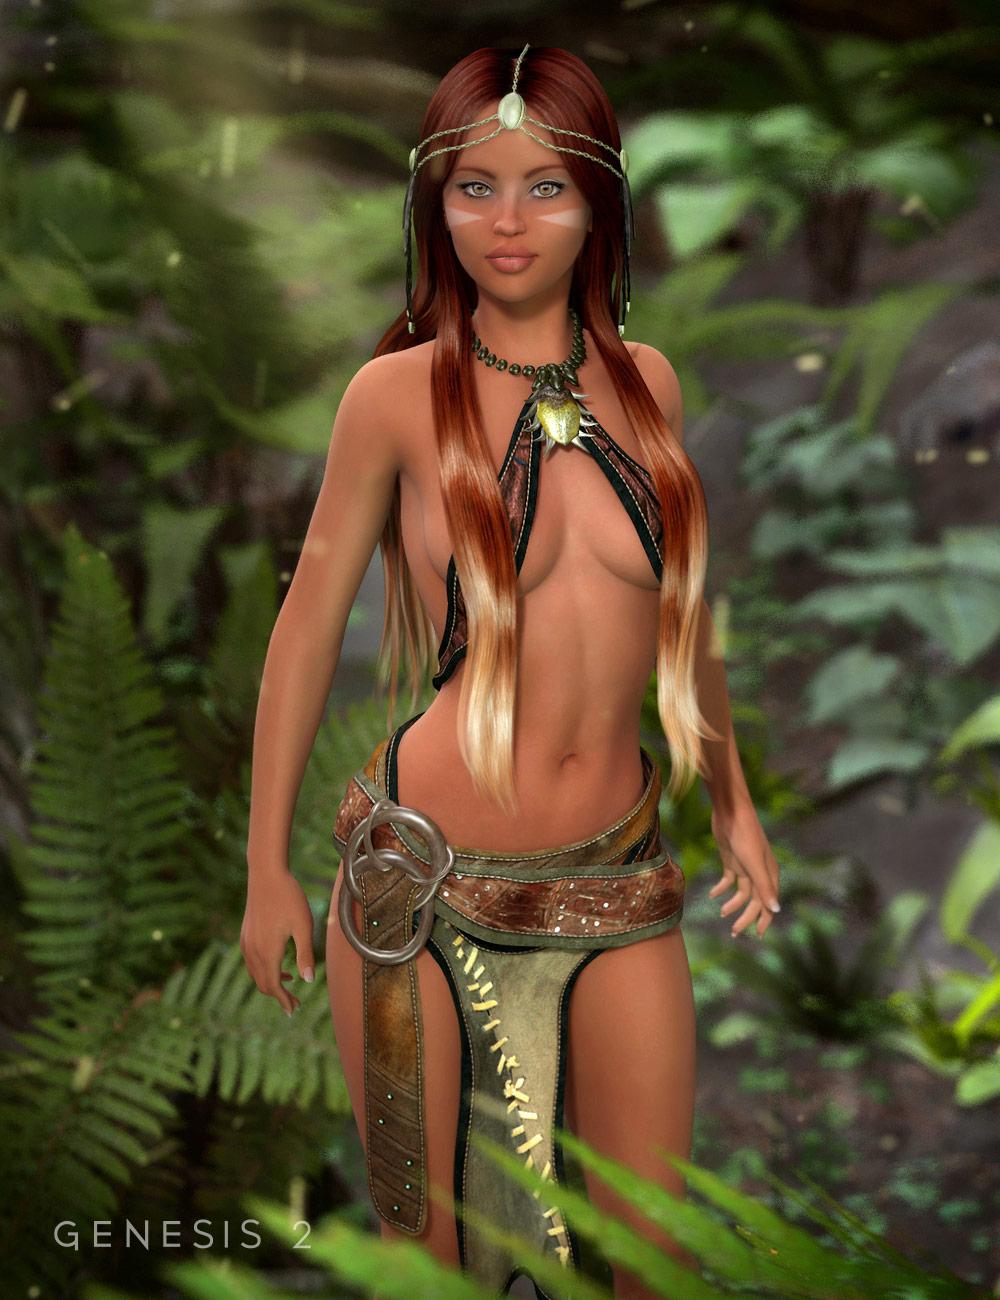 Nidale by: CountessJessaii, 3D Models by Daz 3D